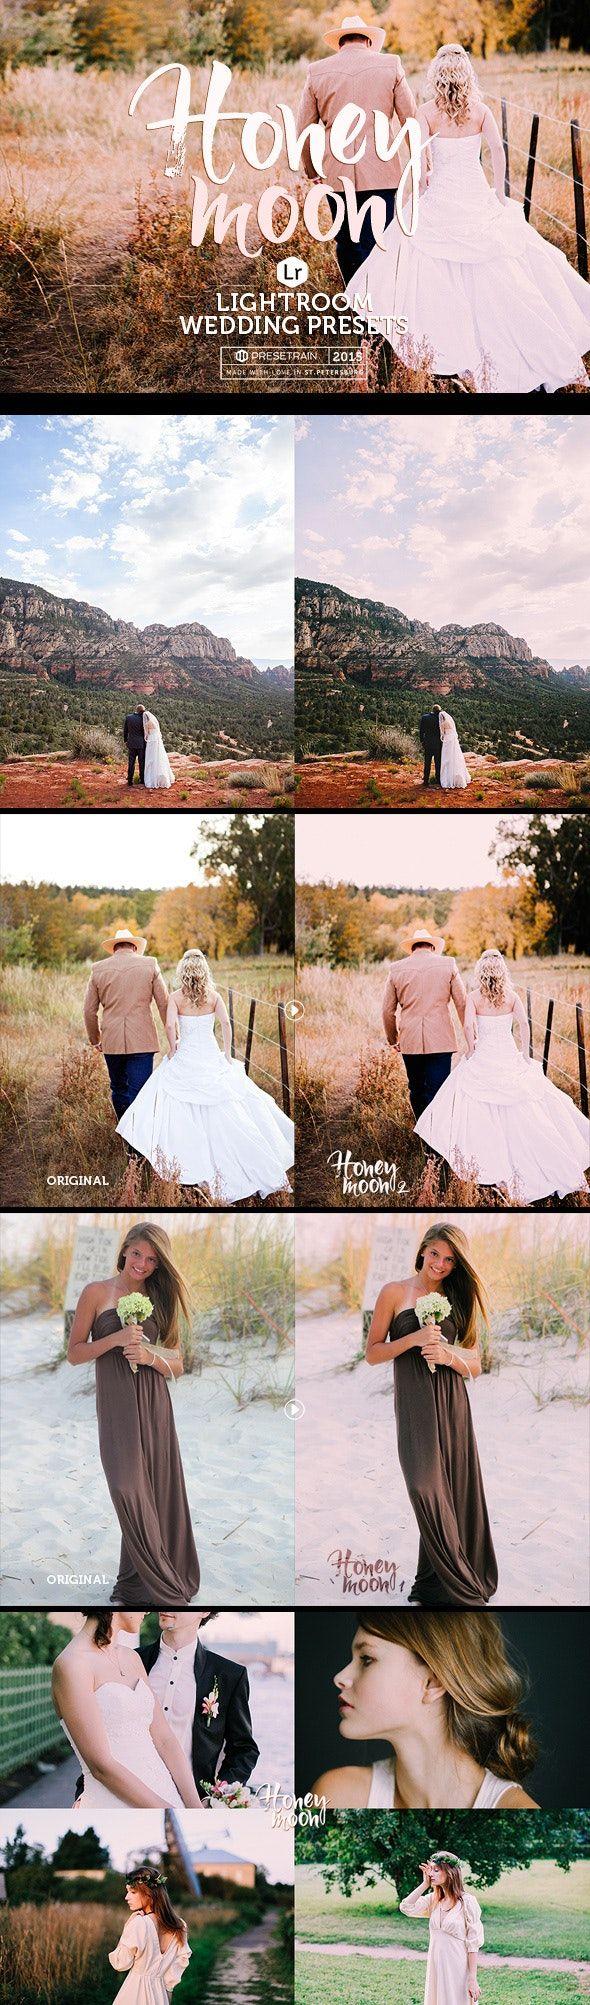 Honeymoon Wedding Lightroom Presets